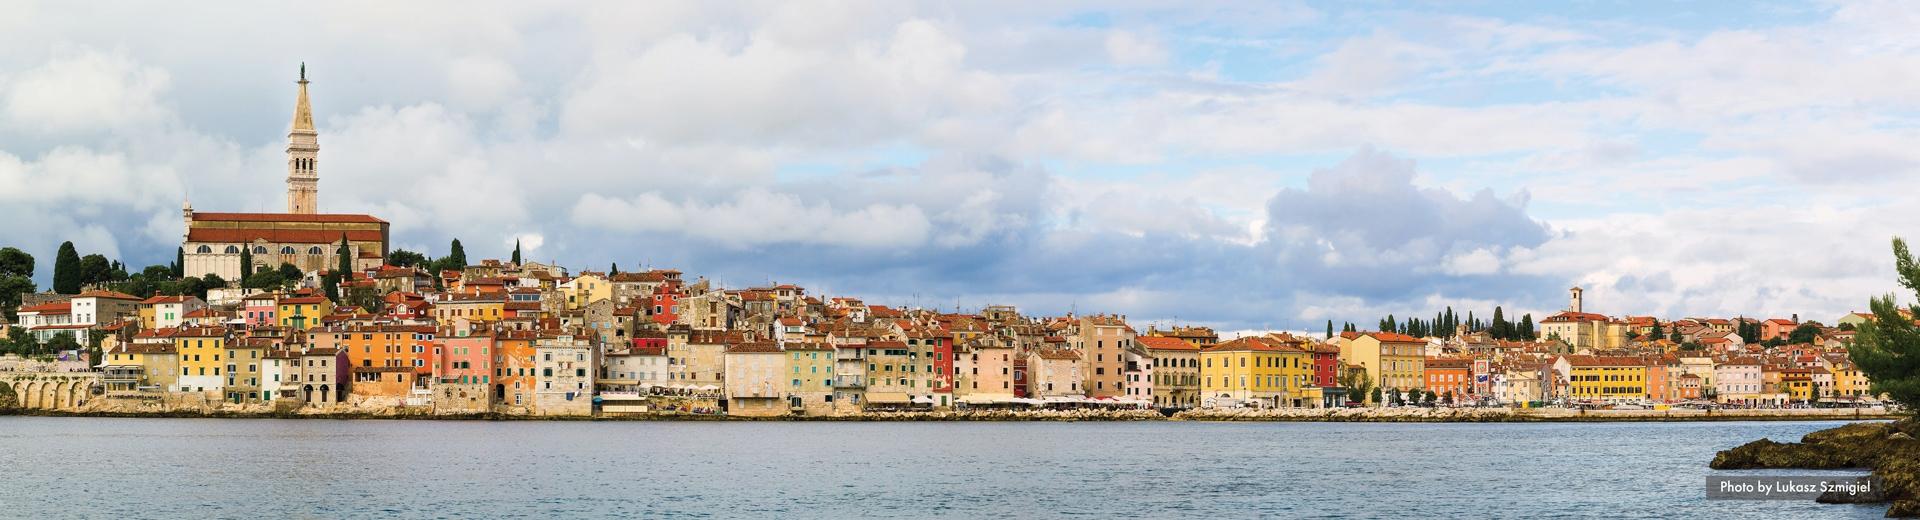 discover croatia rovinj view